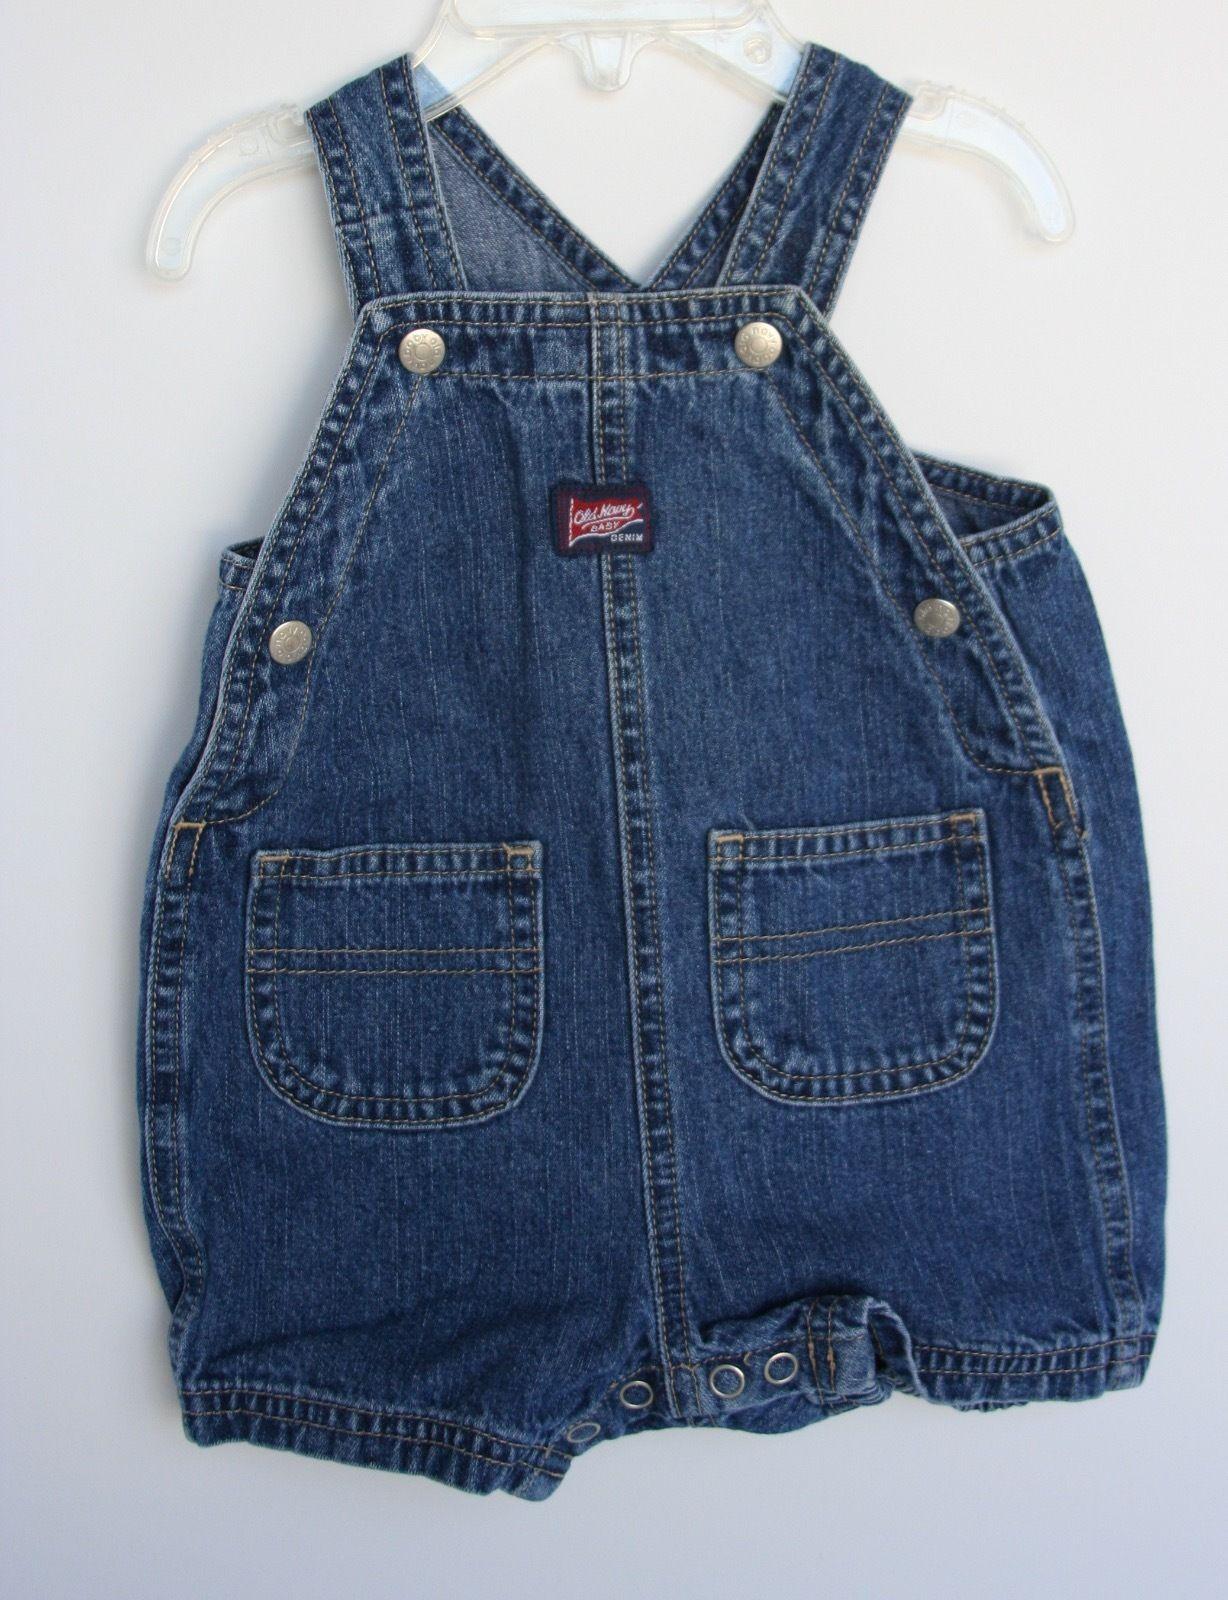 OLD NAVY Baby Denim Short Overalls 3-6 months Snaps 100% Cotton - $9.89